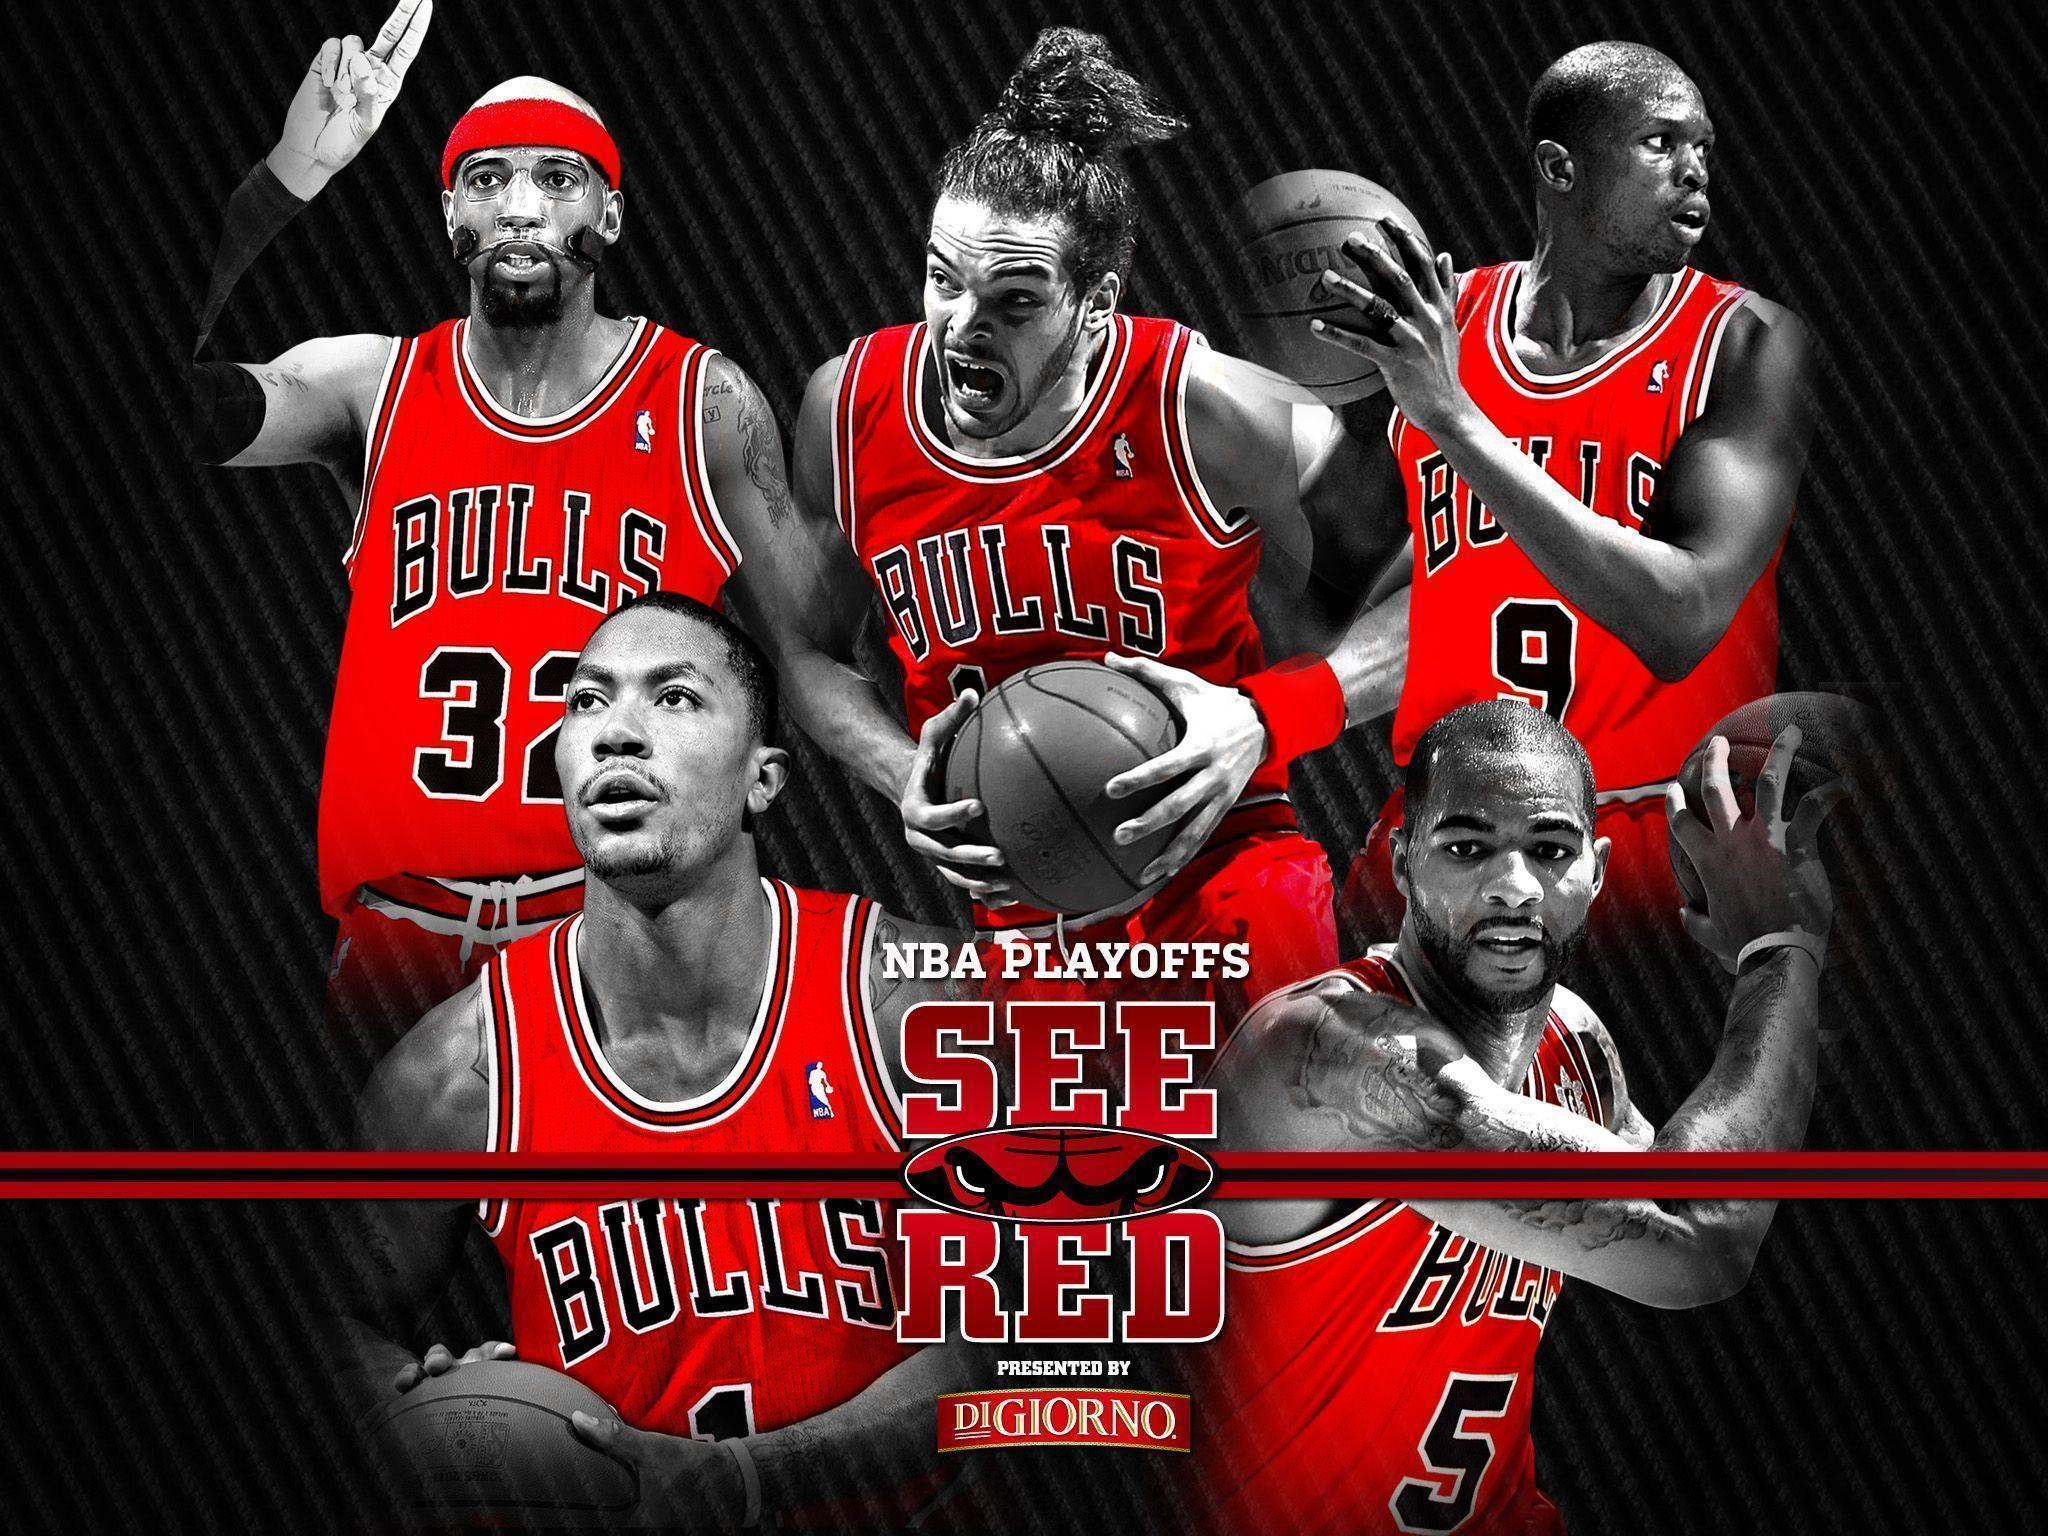 chicago bulls logo Wallpaper HD | wallalay.com